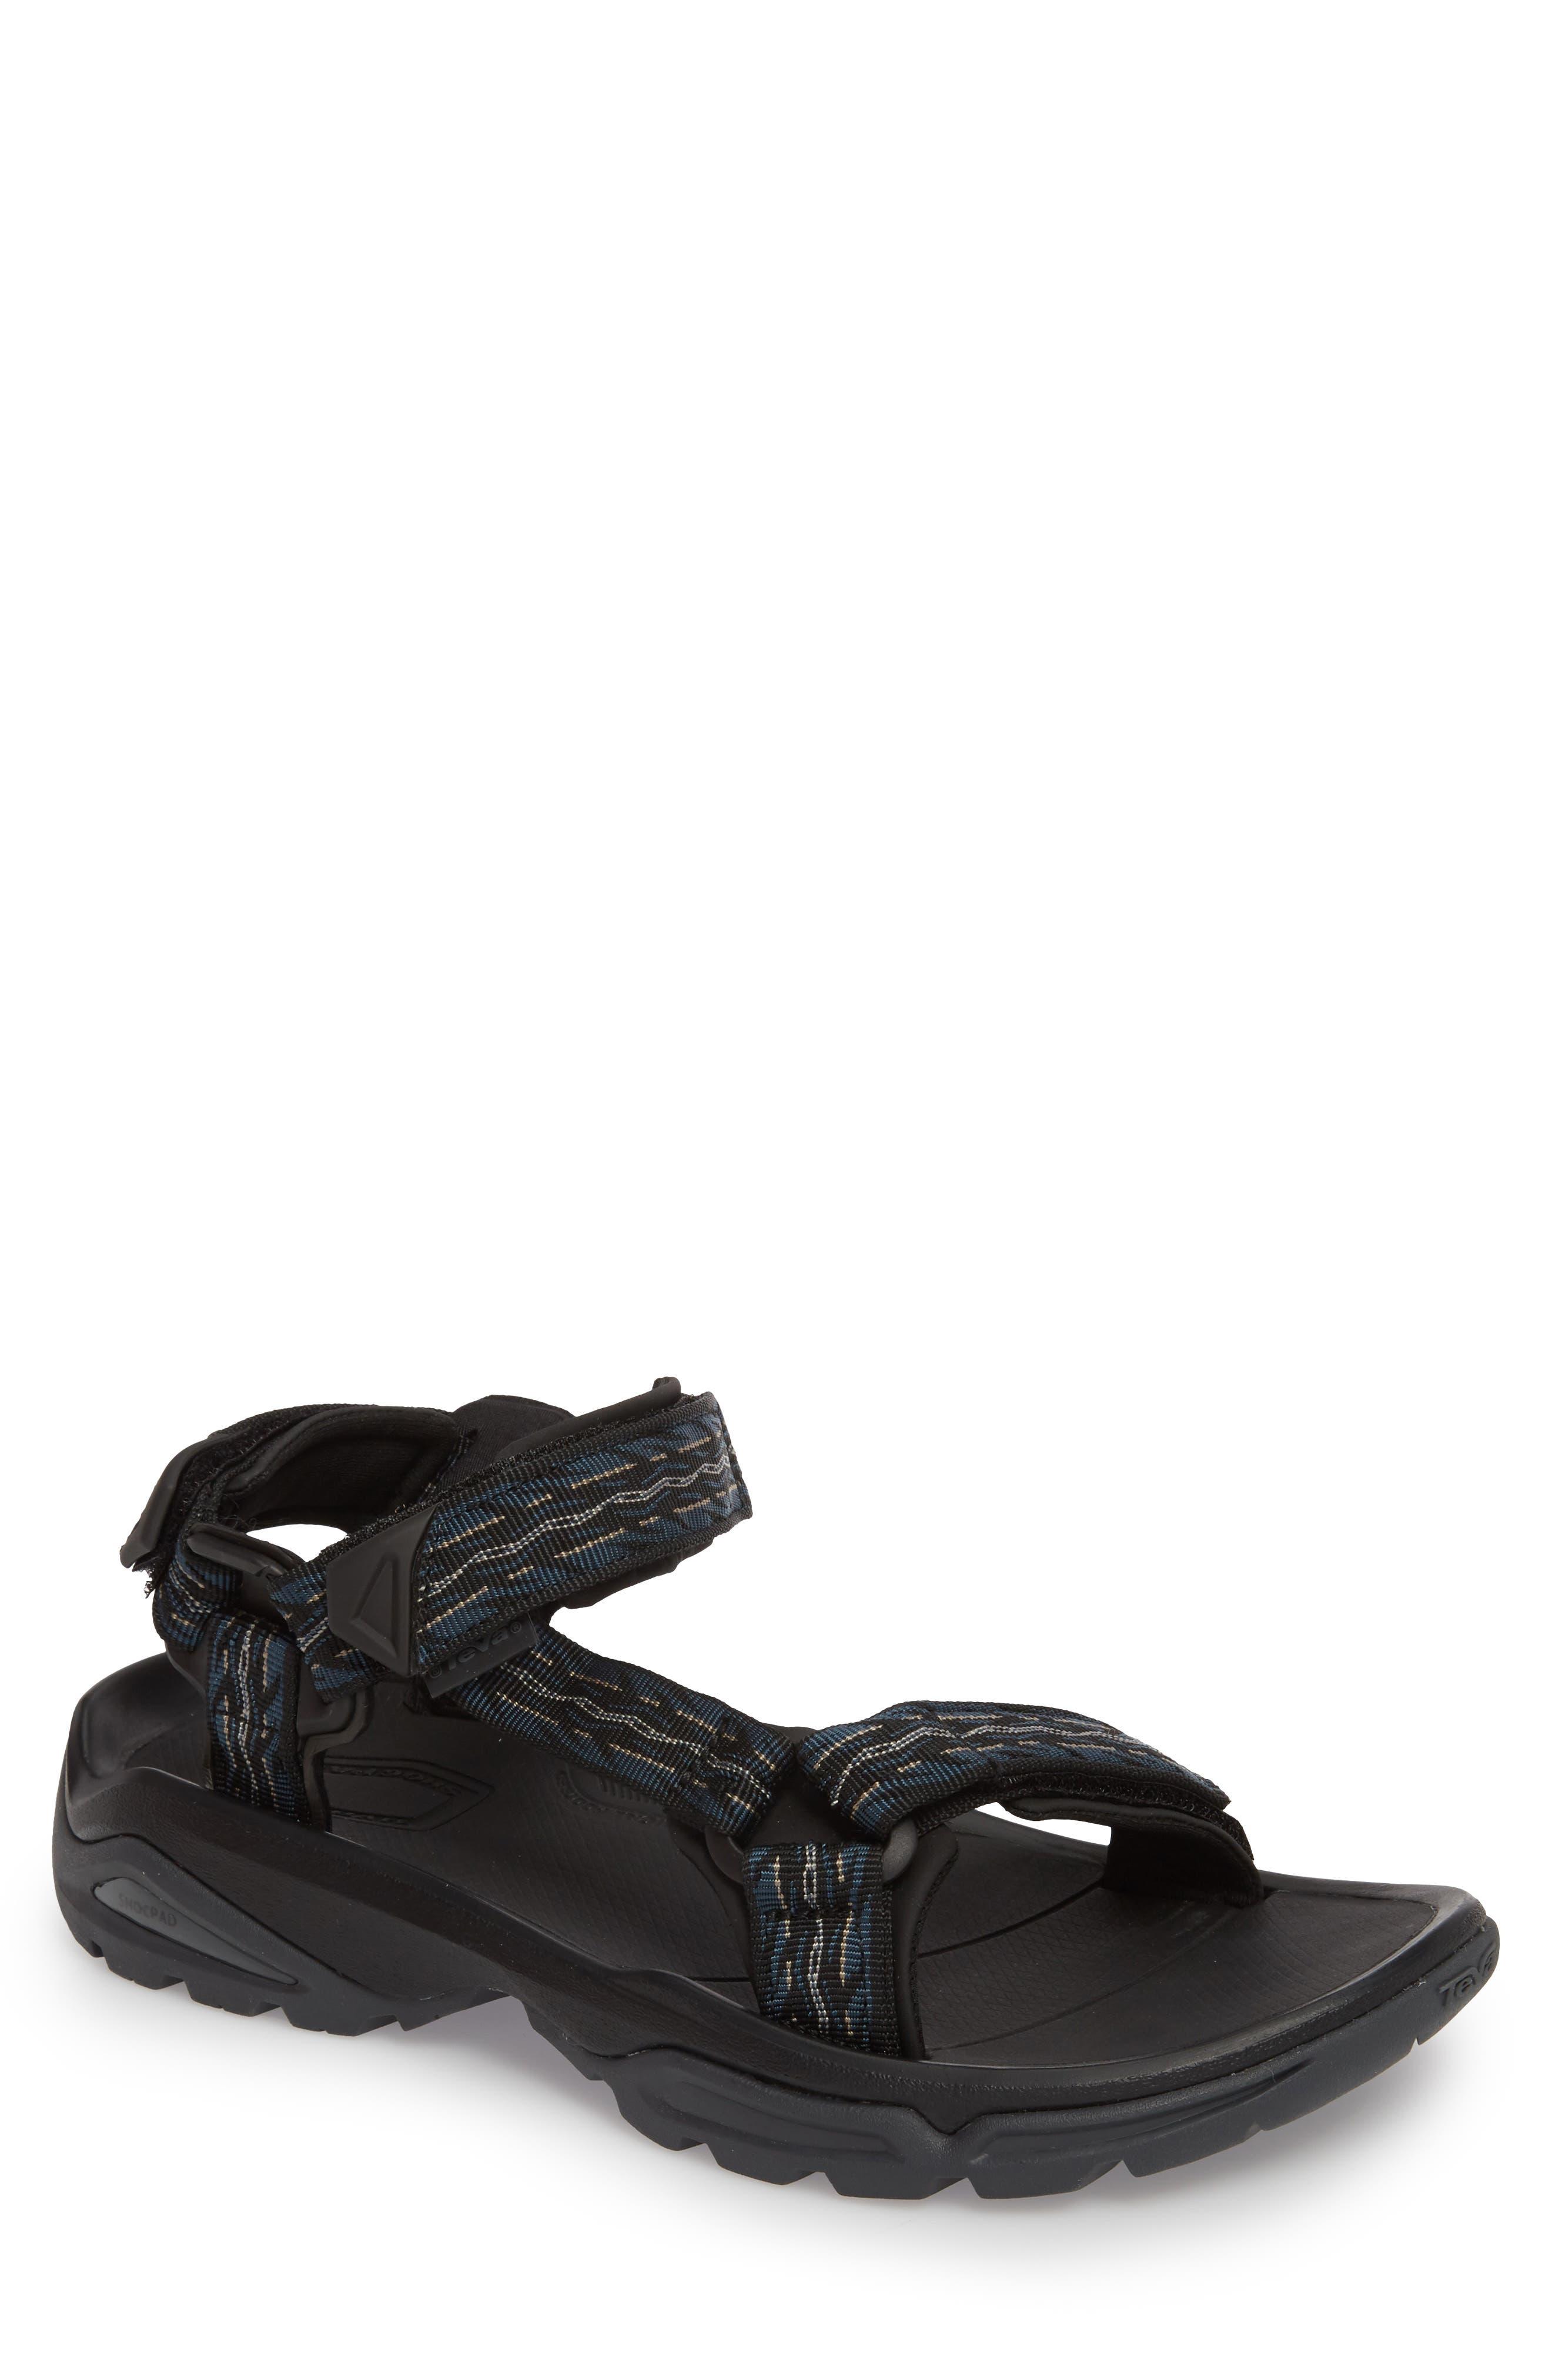 Terra Fi 4 Sport Sandal,                         Main,                         color, Midnight Blue Nylon